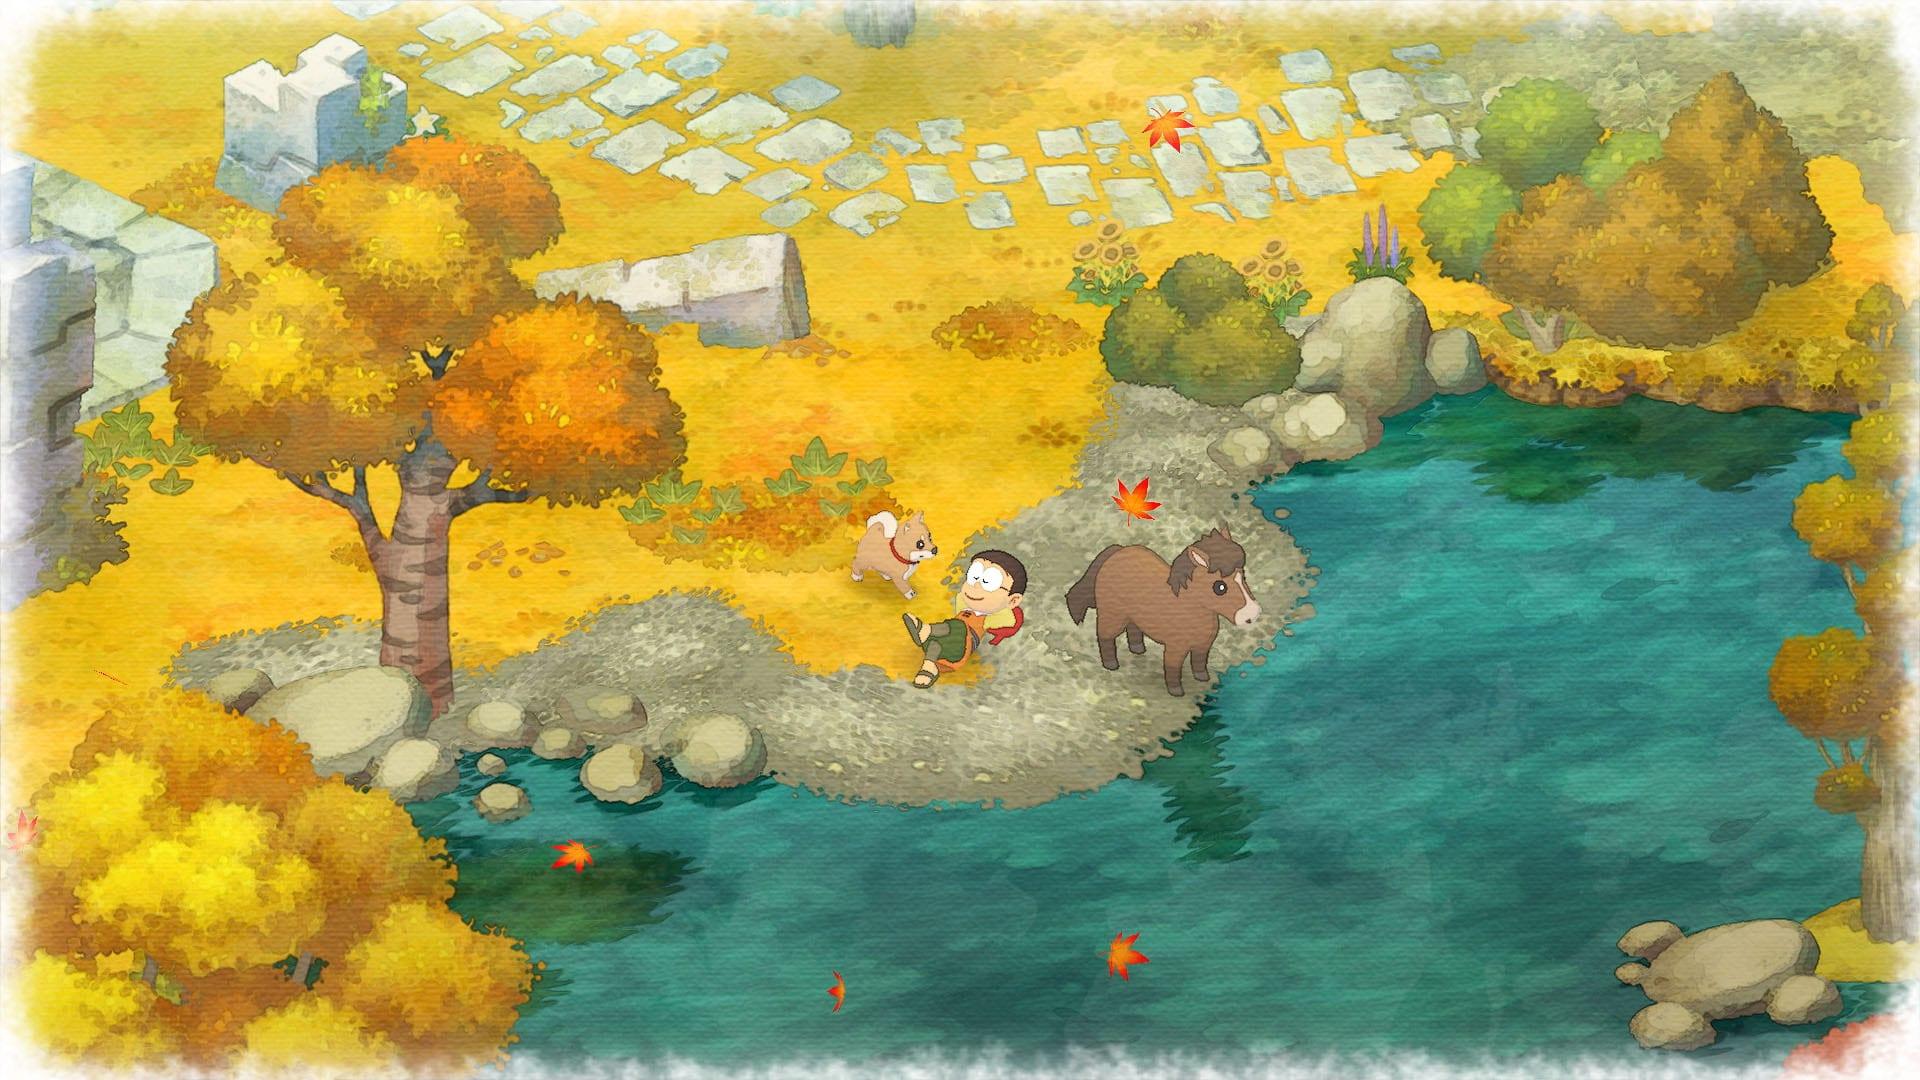 Doraemon Story of Seasons Uprooting onto PlayStation 4 on September 4